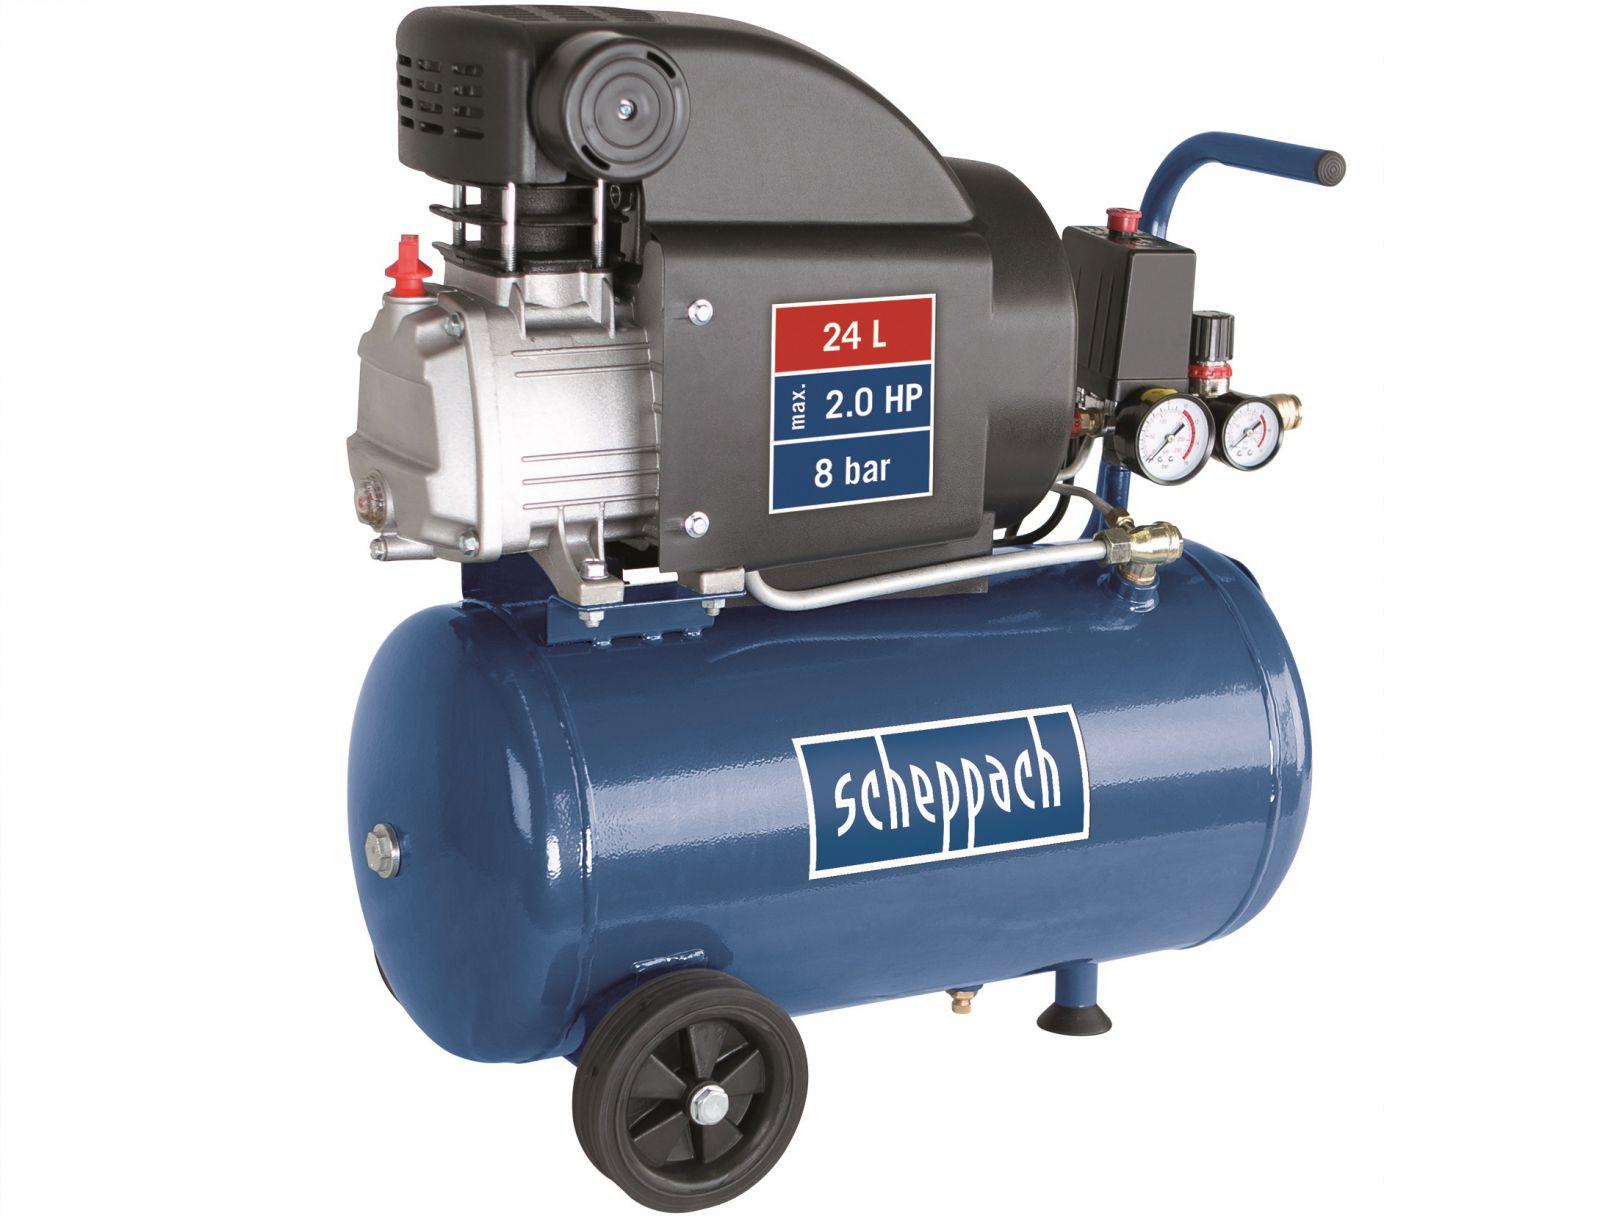 Olejový kompresor Scheppach HC 25 - 8 bar, 220 l/min, 24 l